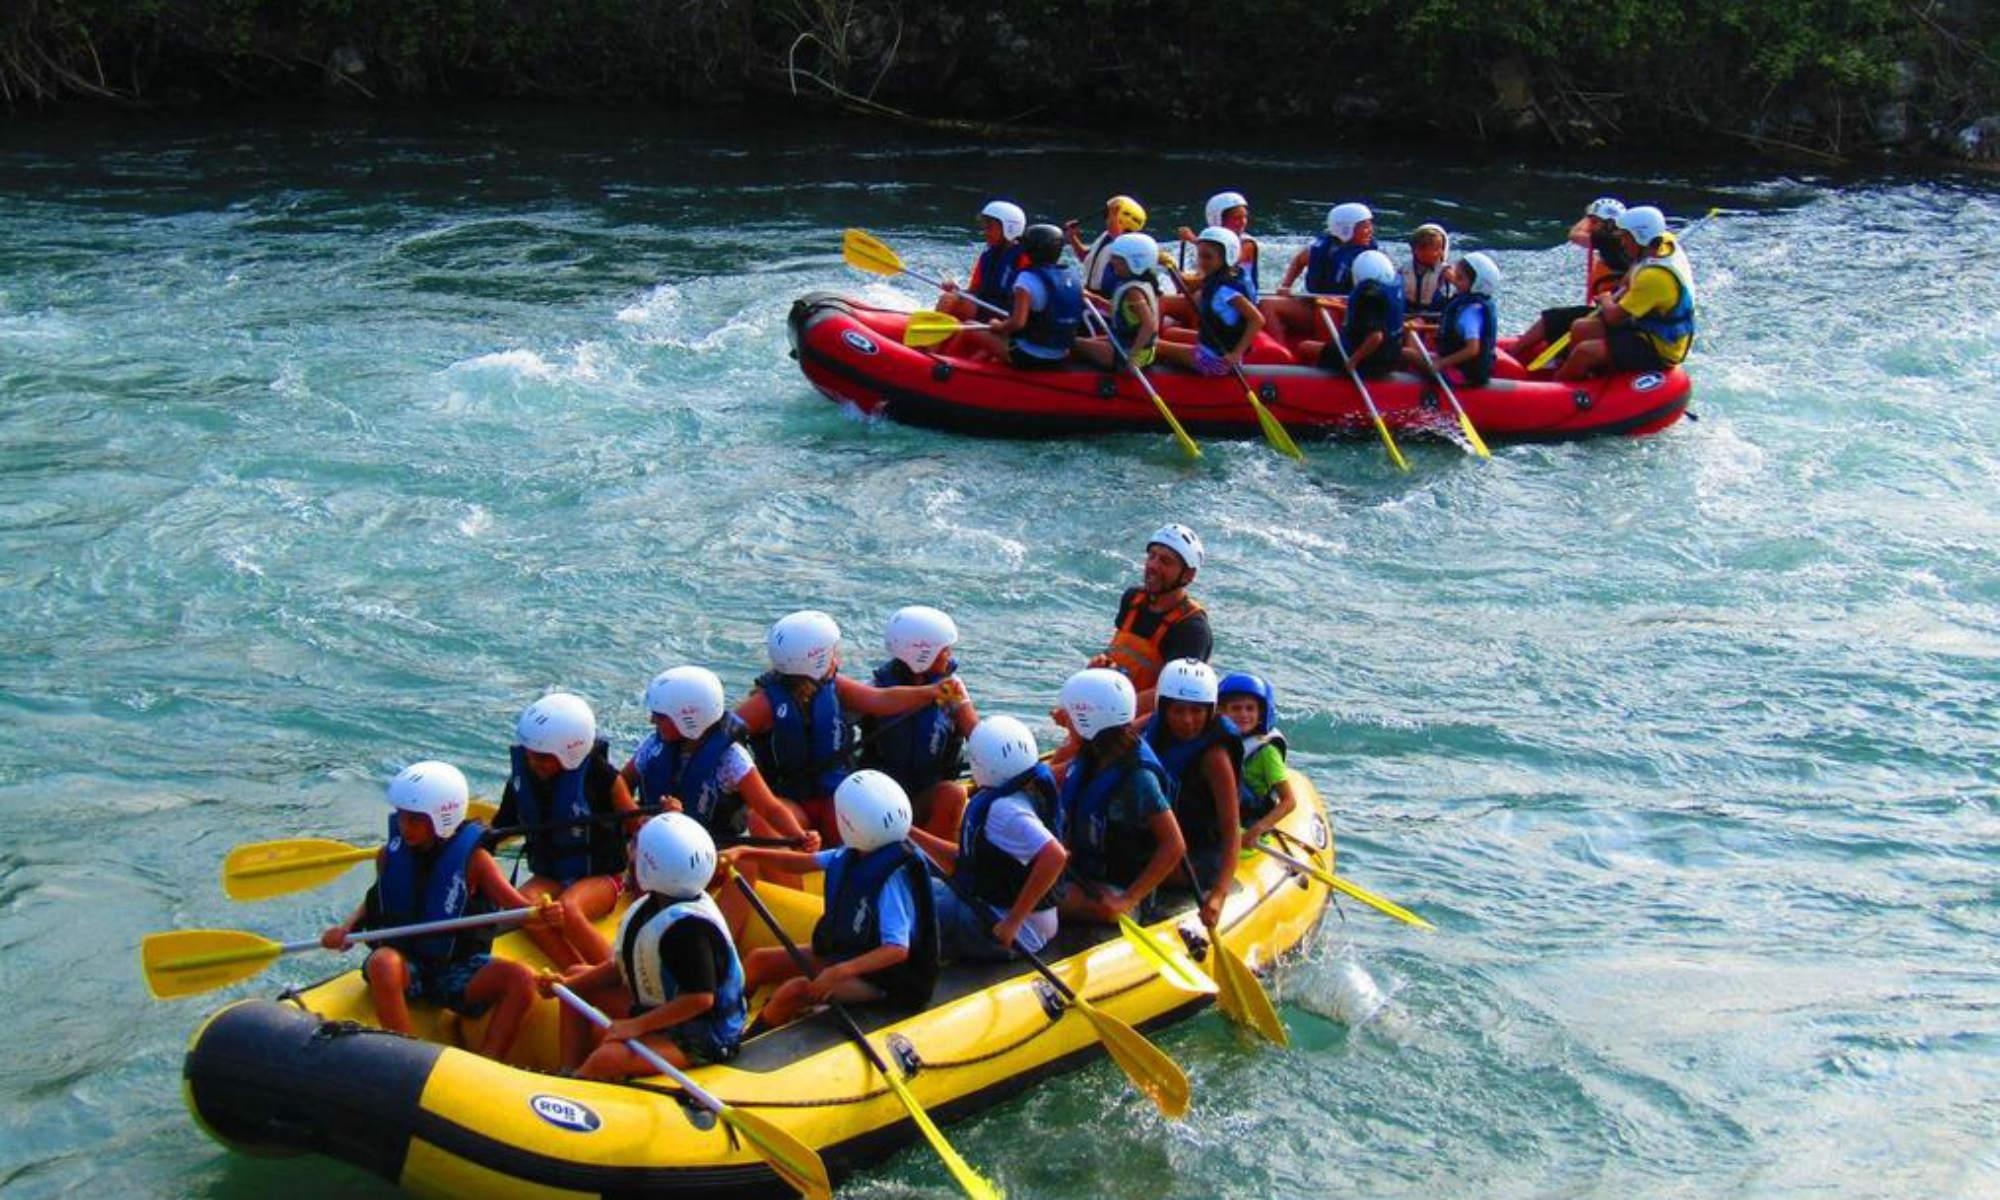 rafting groups navigating their boats along the Gari River in Italy.